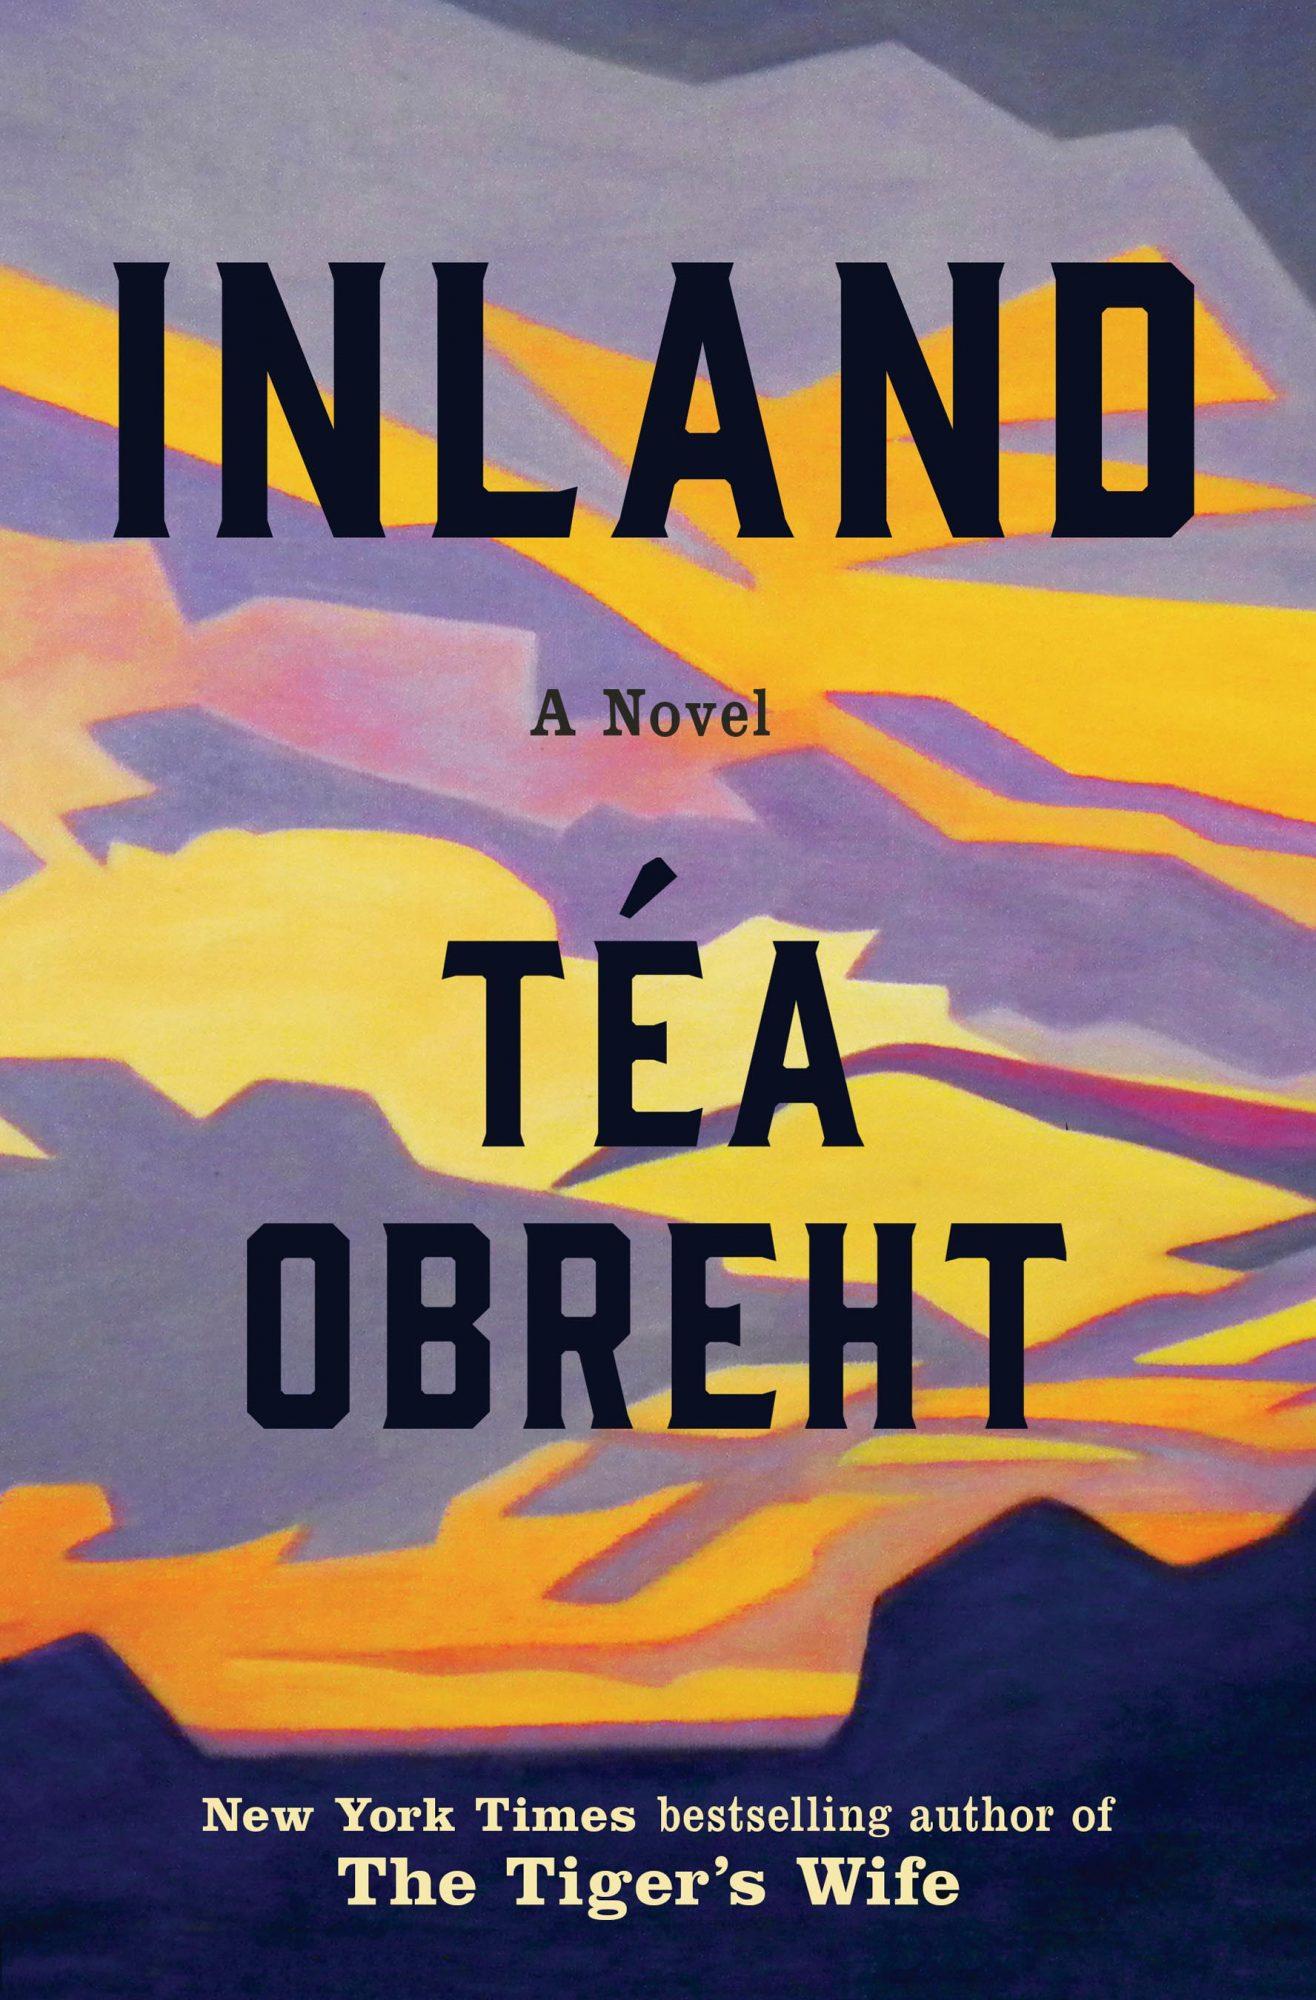 inland_tea-obreht.jpg